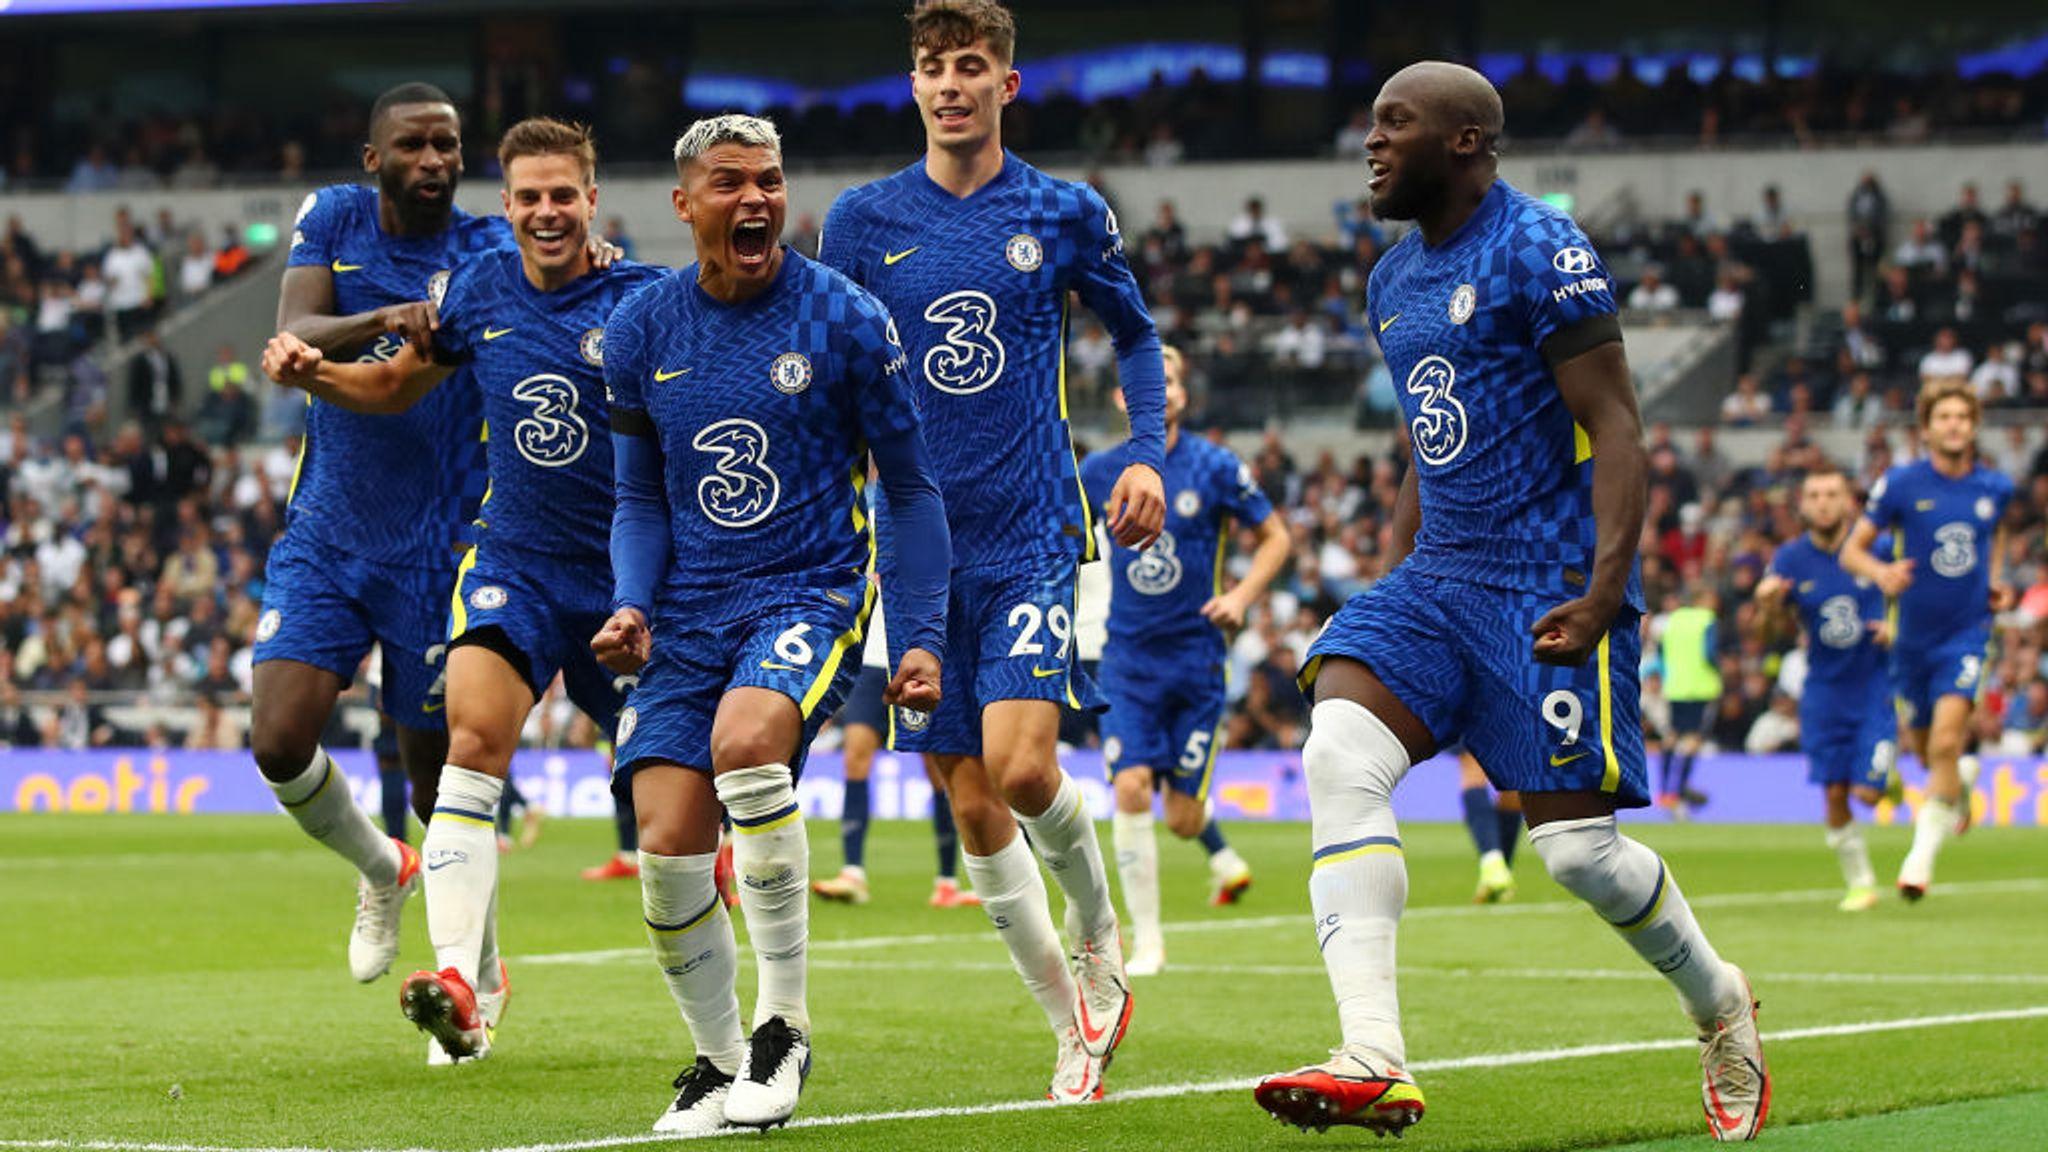 Tottenham 0-3 Chelsea: Thiago Silva, N'Golo Kante, Antonio Rudiger on target on day of tributes for Jimmy Greaves